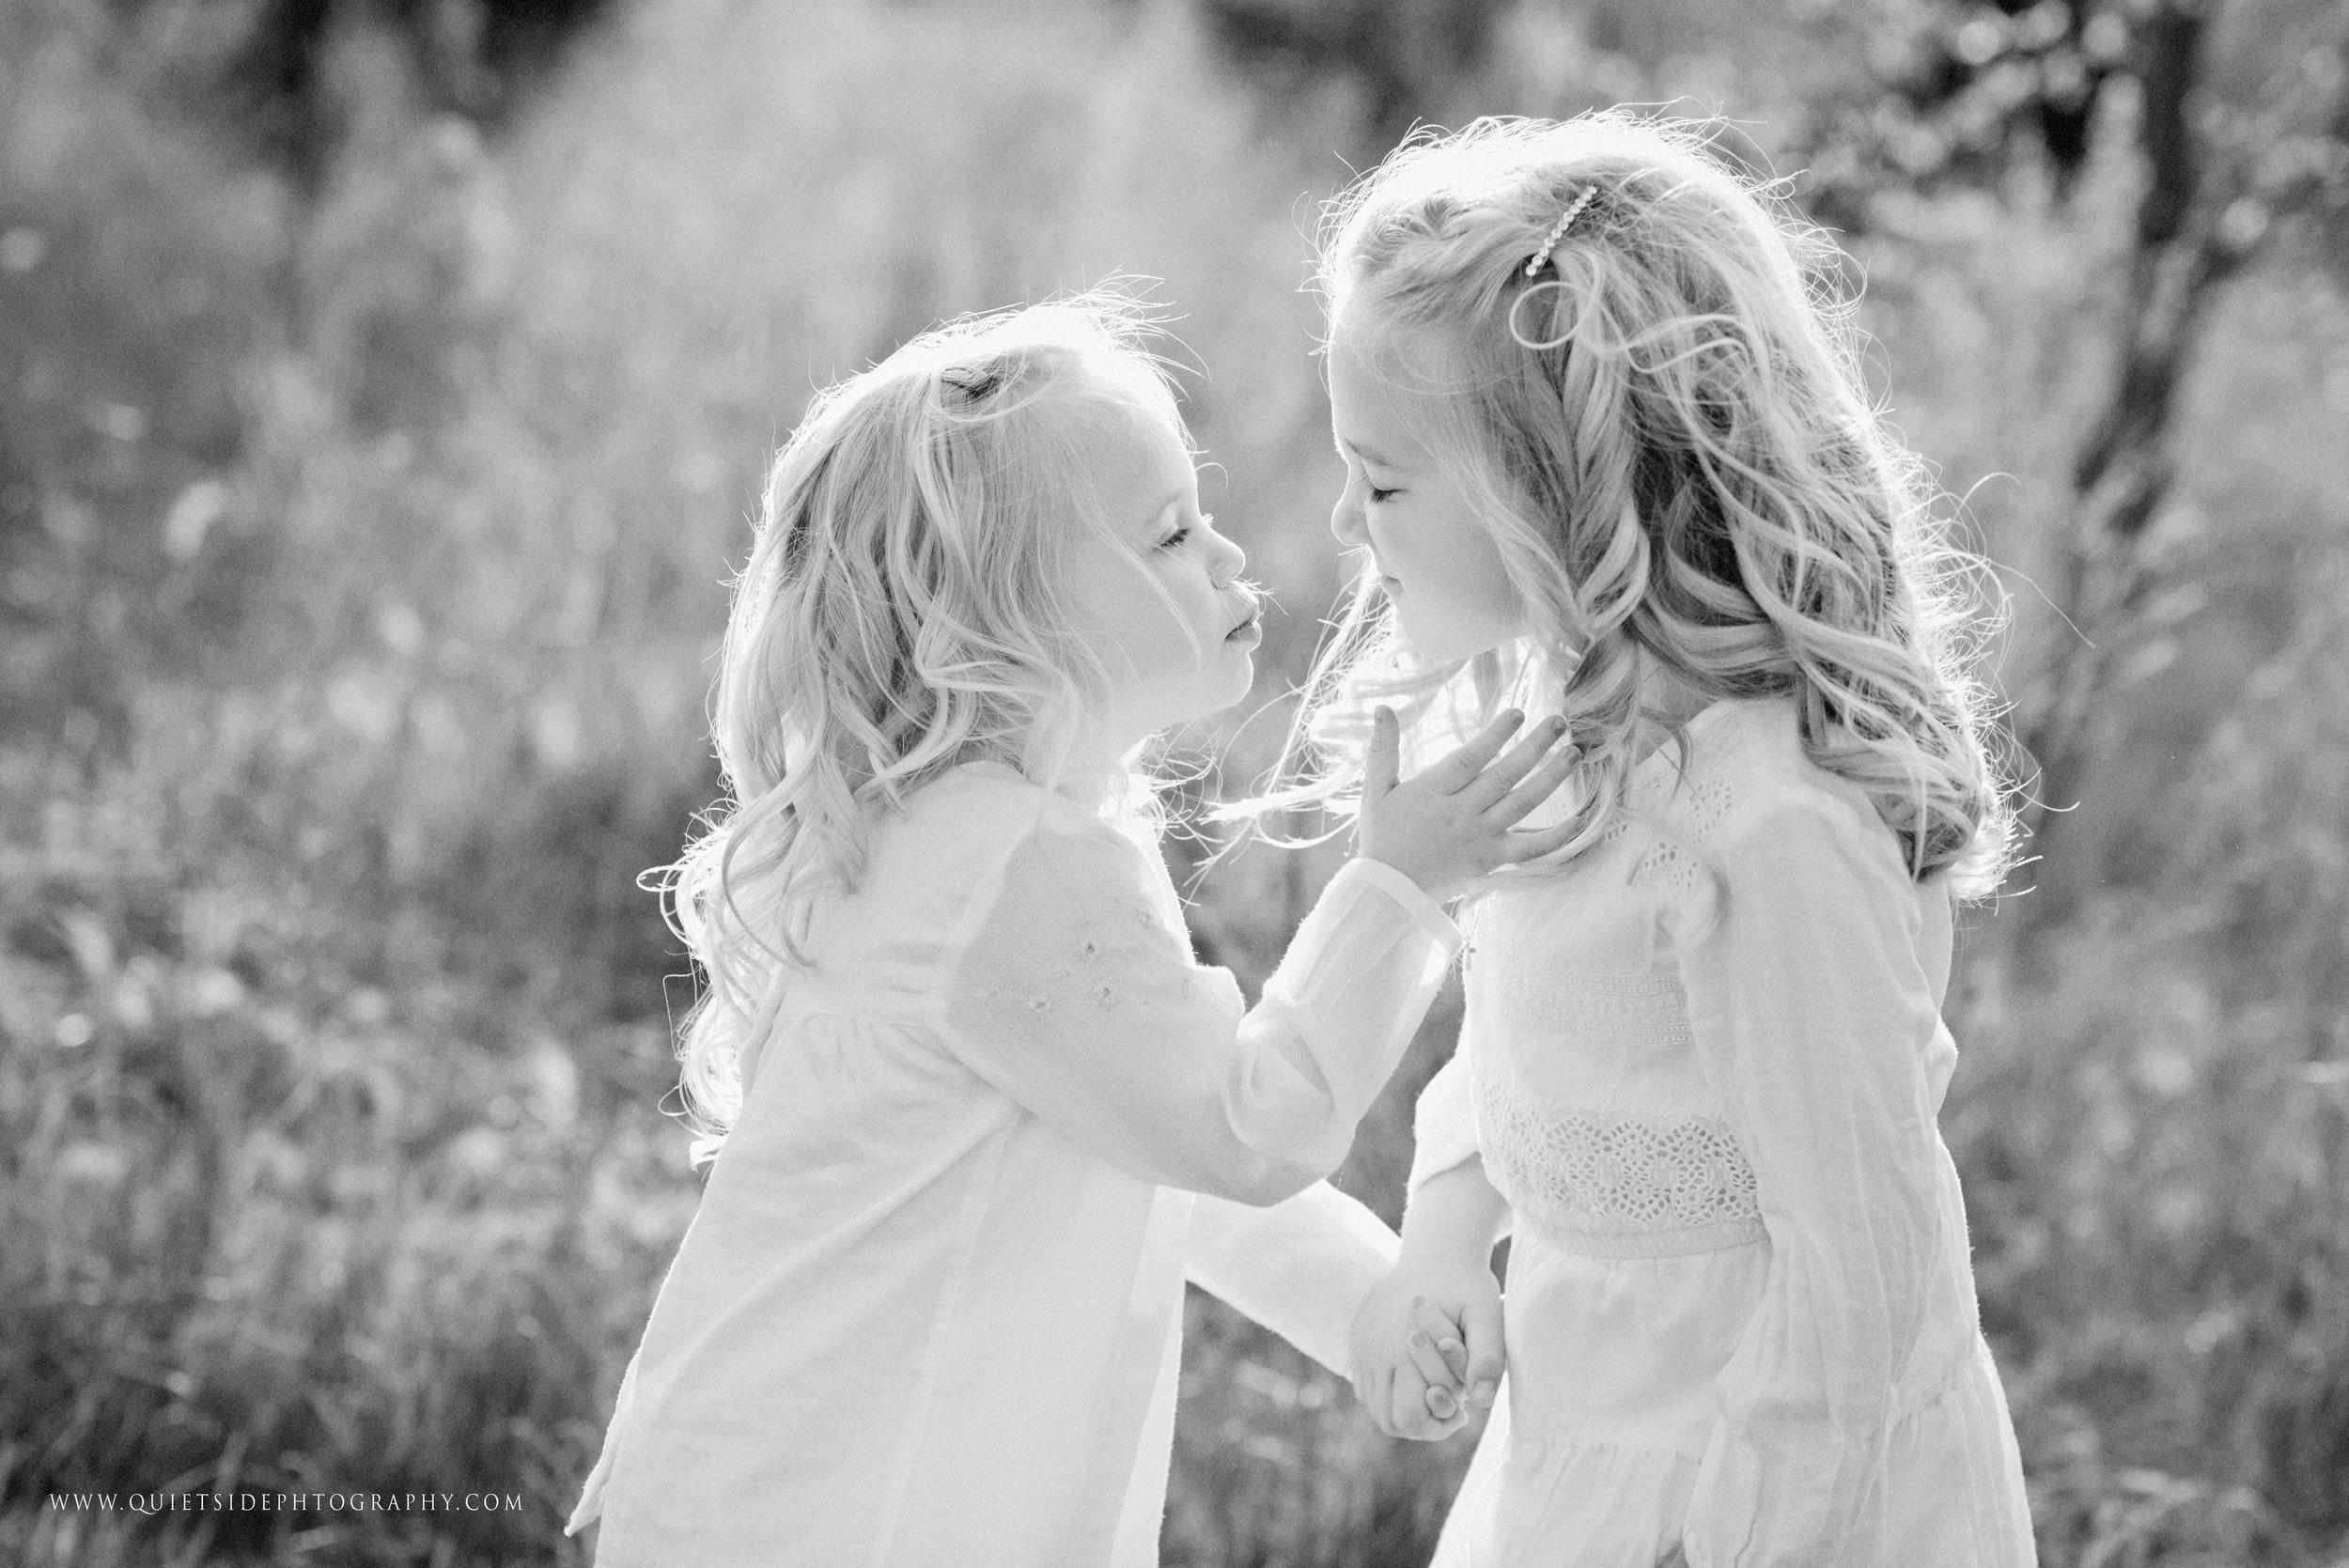 quietside-photography-loudoun-county-virginia-northernvirginia-washingtondc-maternityphotographer-newbornphotographer-motherhoodphotographer-familyphotographer.-cope.jpg